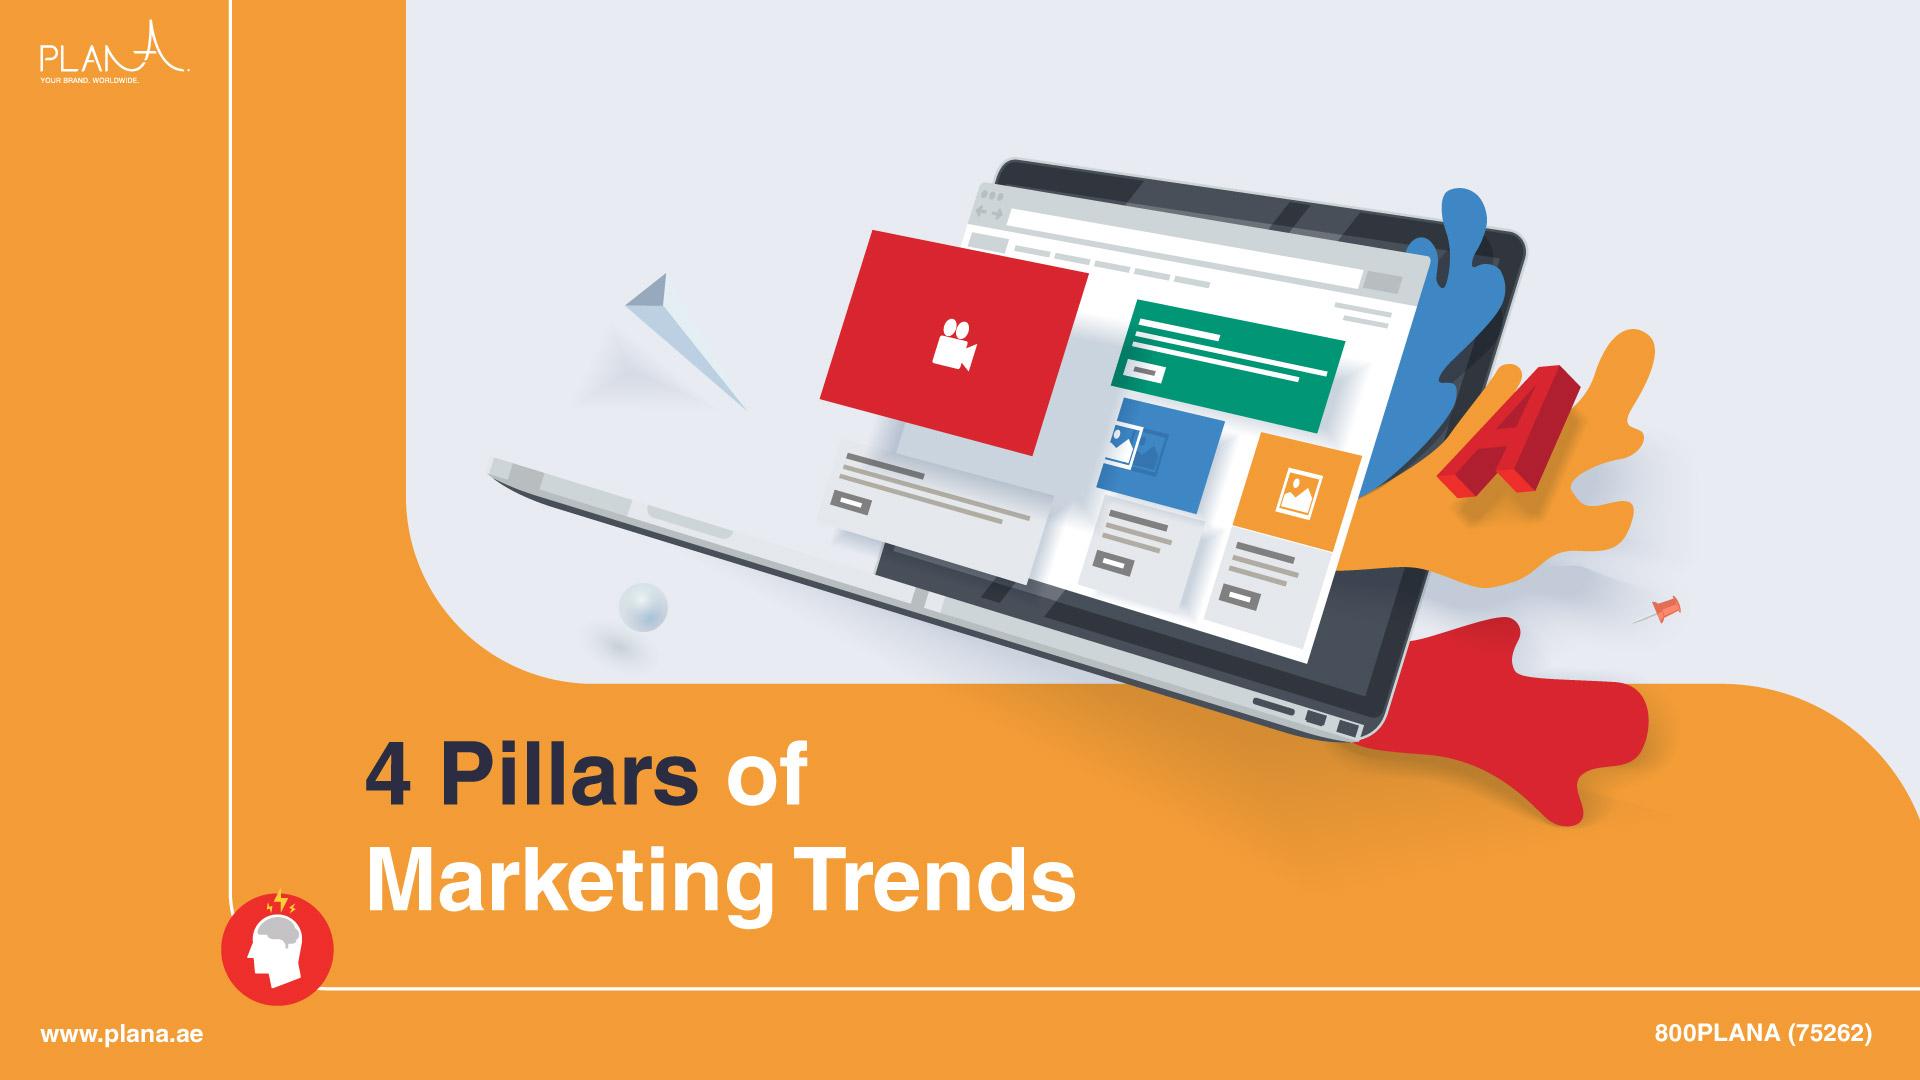 4 Pillars of Marketing Trends